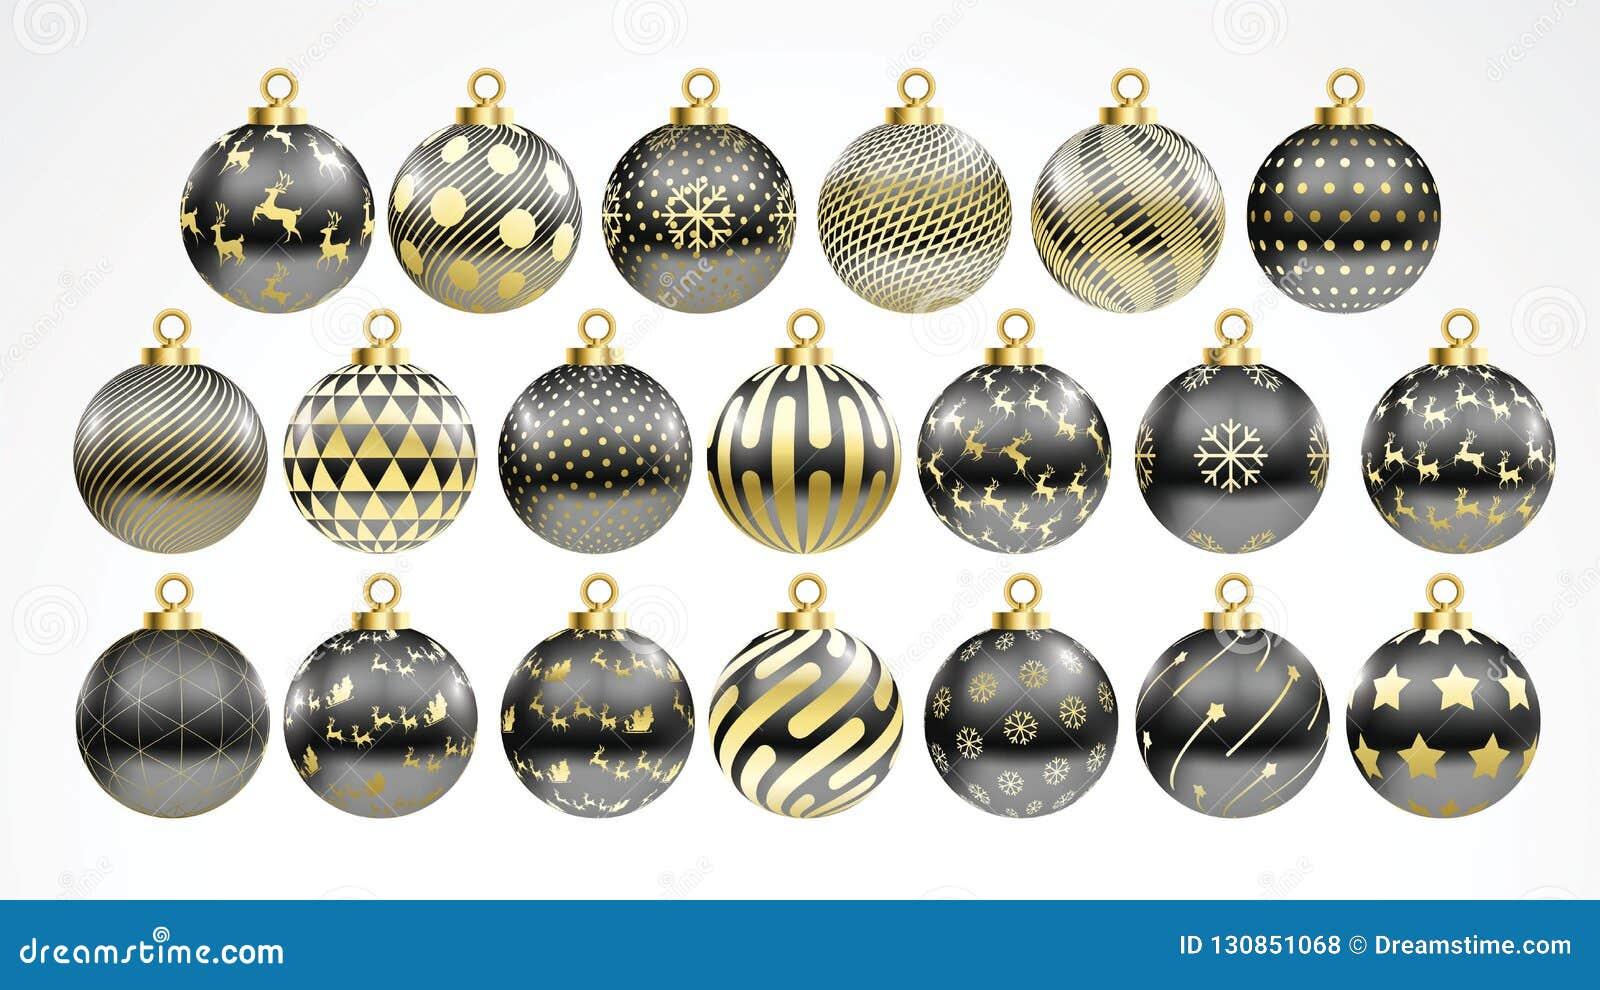 Black Christmas Balls.Set Of Vector Gold And Black Christmas Balls With Ornaments Golden